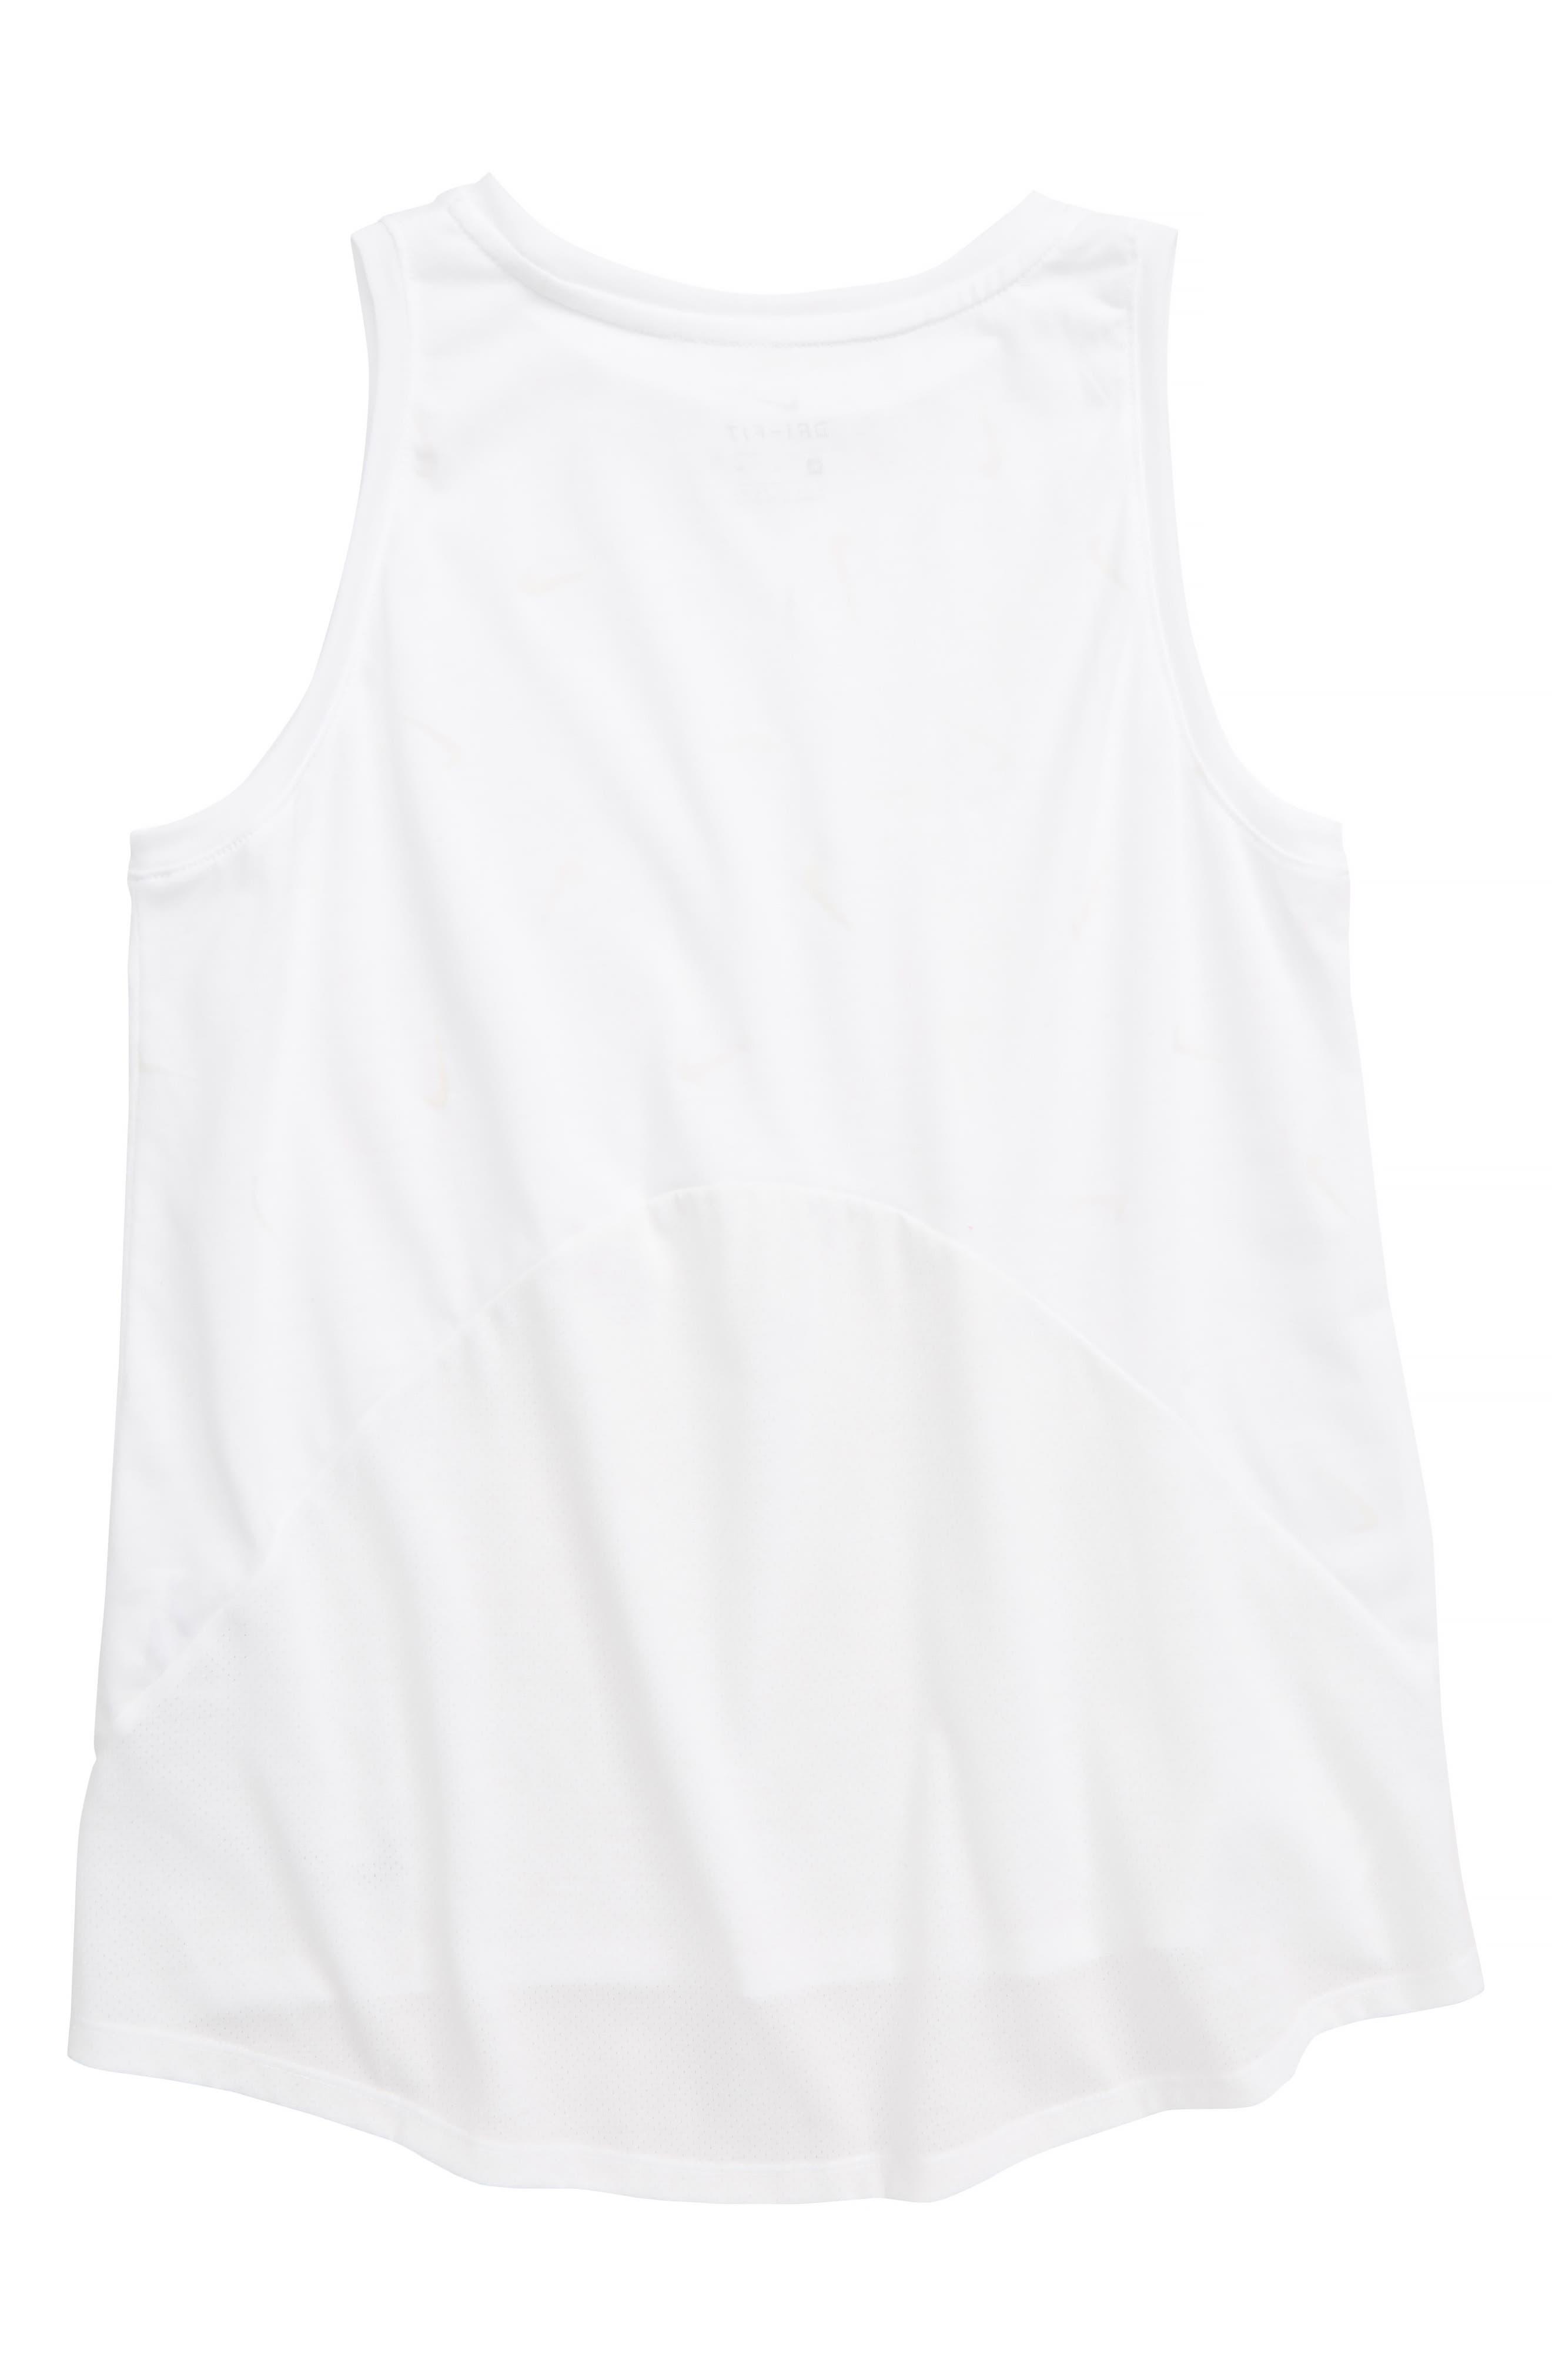 NIKE, Dri-FIT Breathe UV-Activated Logo Print Running Tank, Alternate thumbnail 4, color, WHITE/ REFLECTIVE SILV